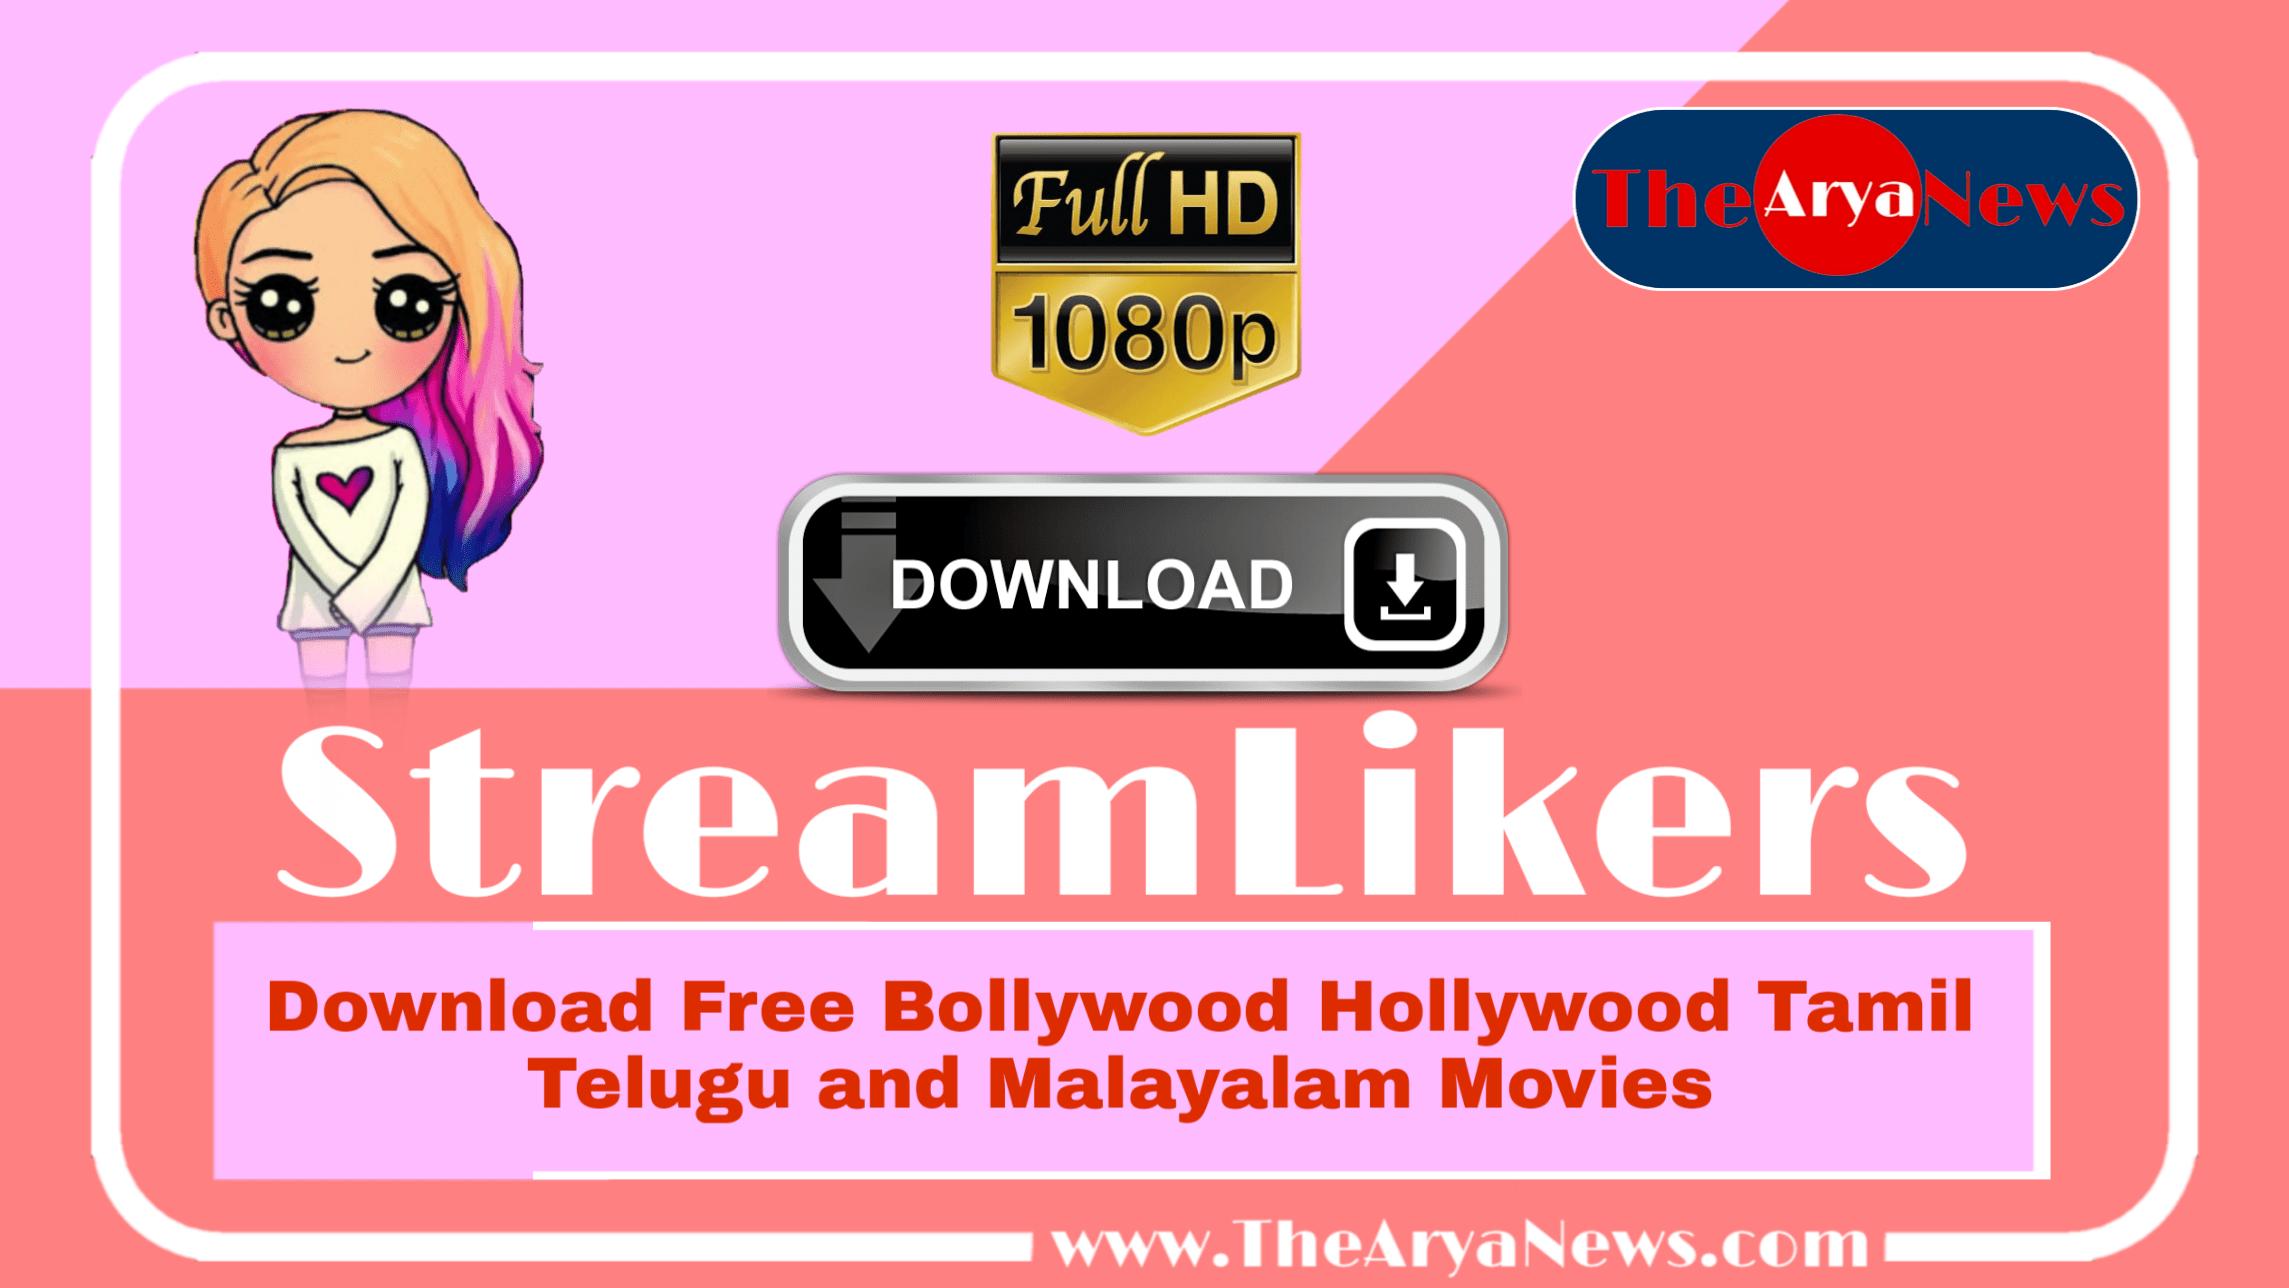 StreamLikers » (2020) Free Watch Movie Online, Download HD Movies